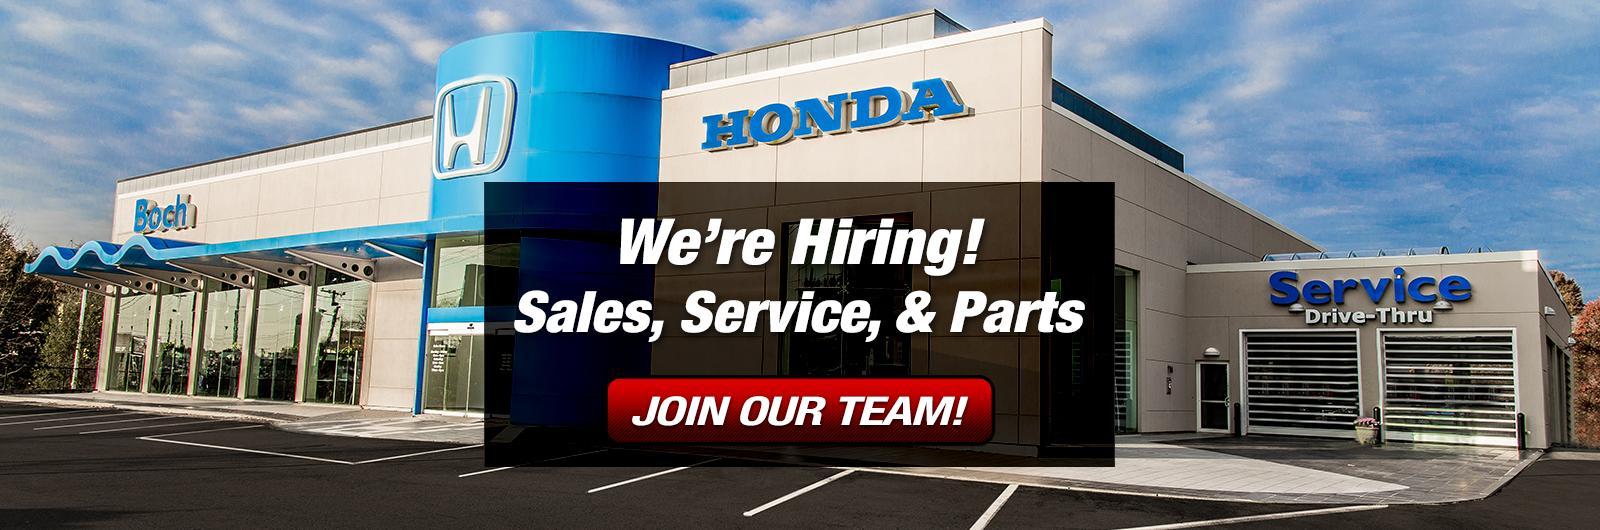 Boch honda honda dealership norwood ma serving boston for Honda dealership ma